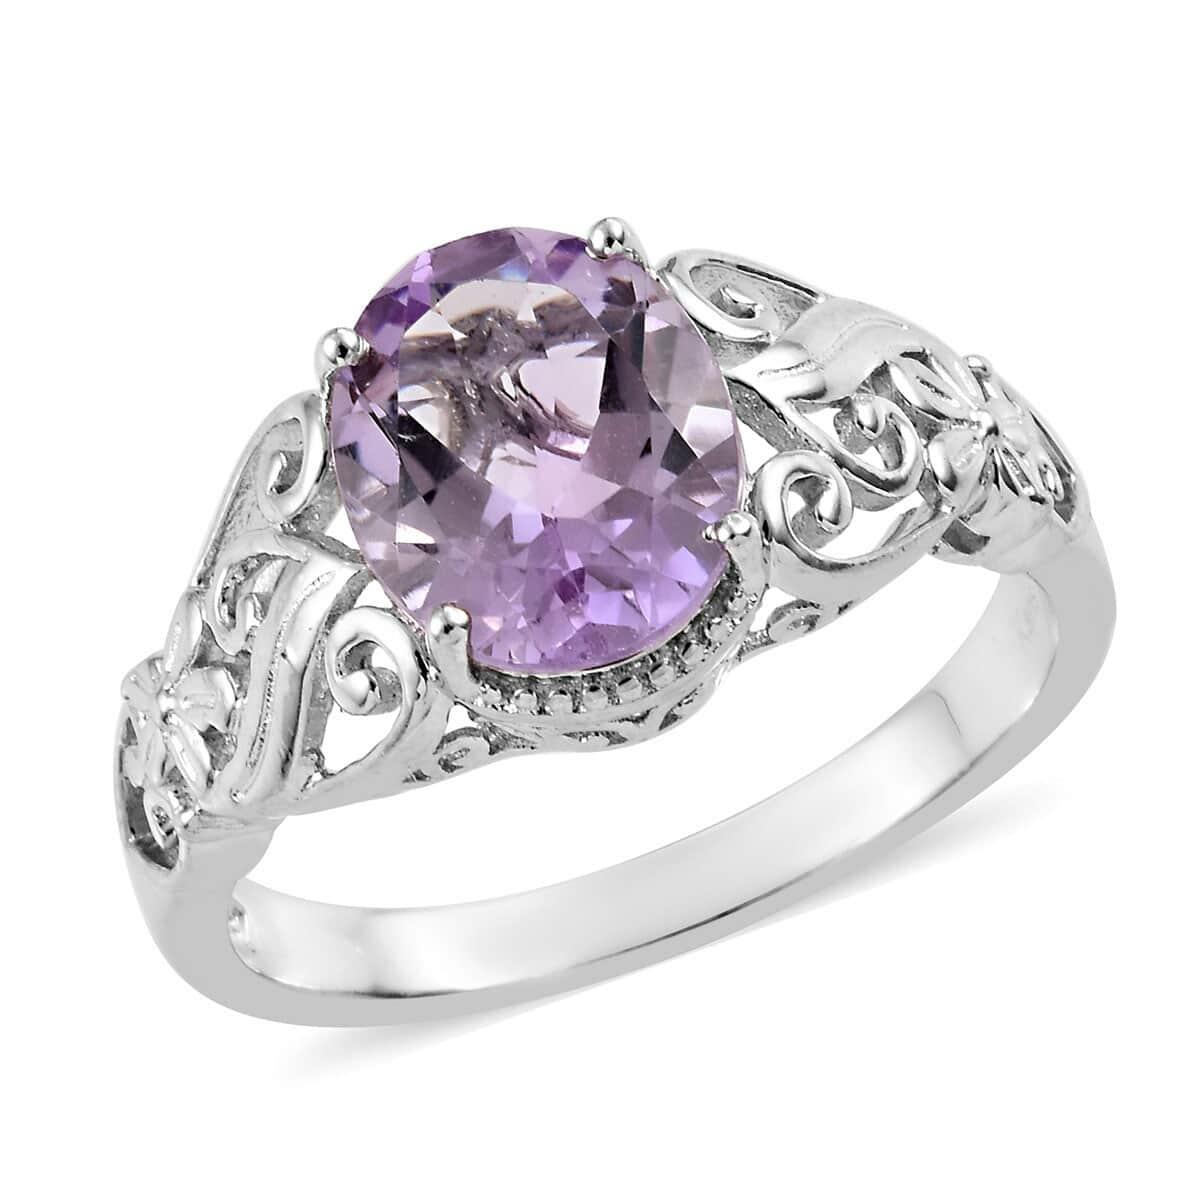 KARIS Rose De France Amethyst Ring in Platinum Bond Brass (Size 11.0) 3.20 ctw